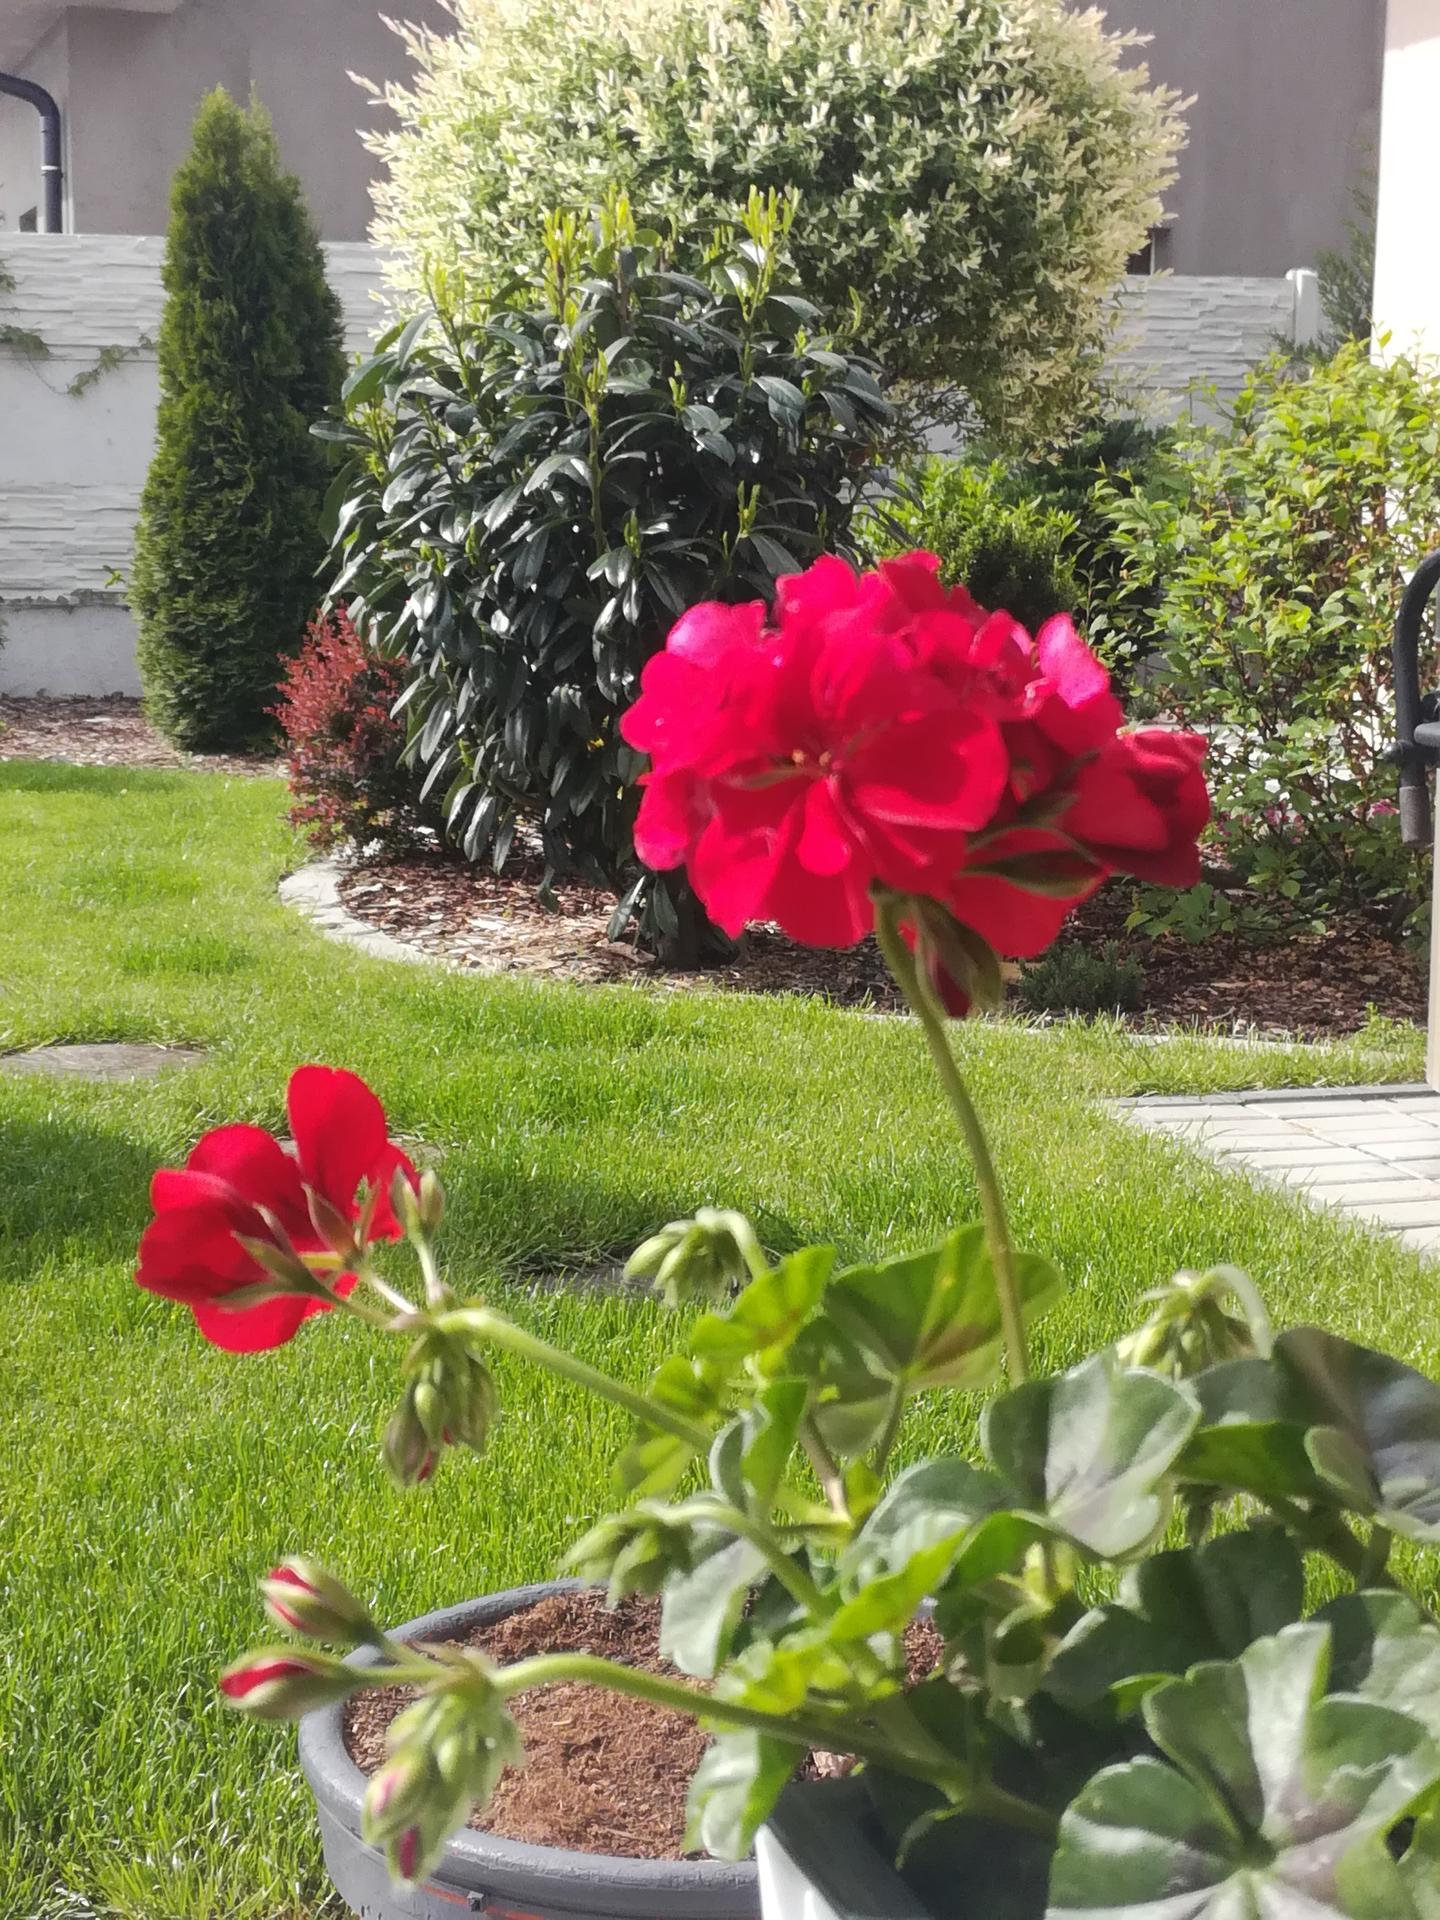 Zahrada 2021 🌲 - Obrázek č. 74